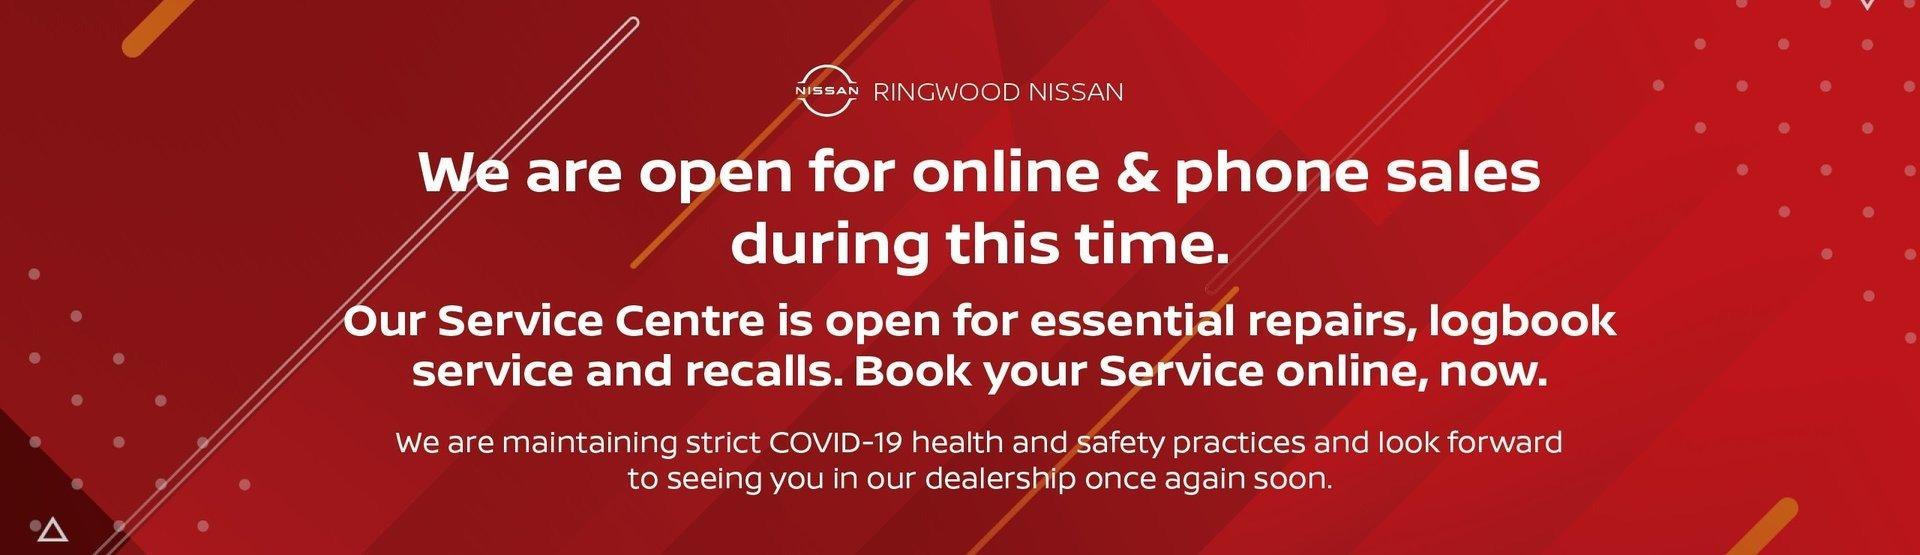 Ringwood_Nissan_Lockdown